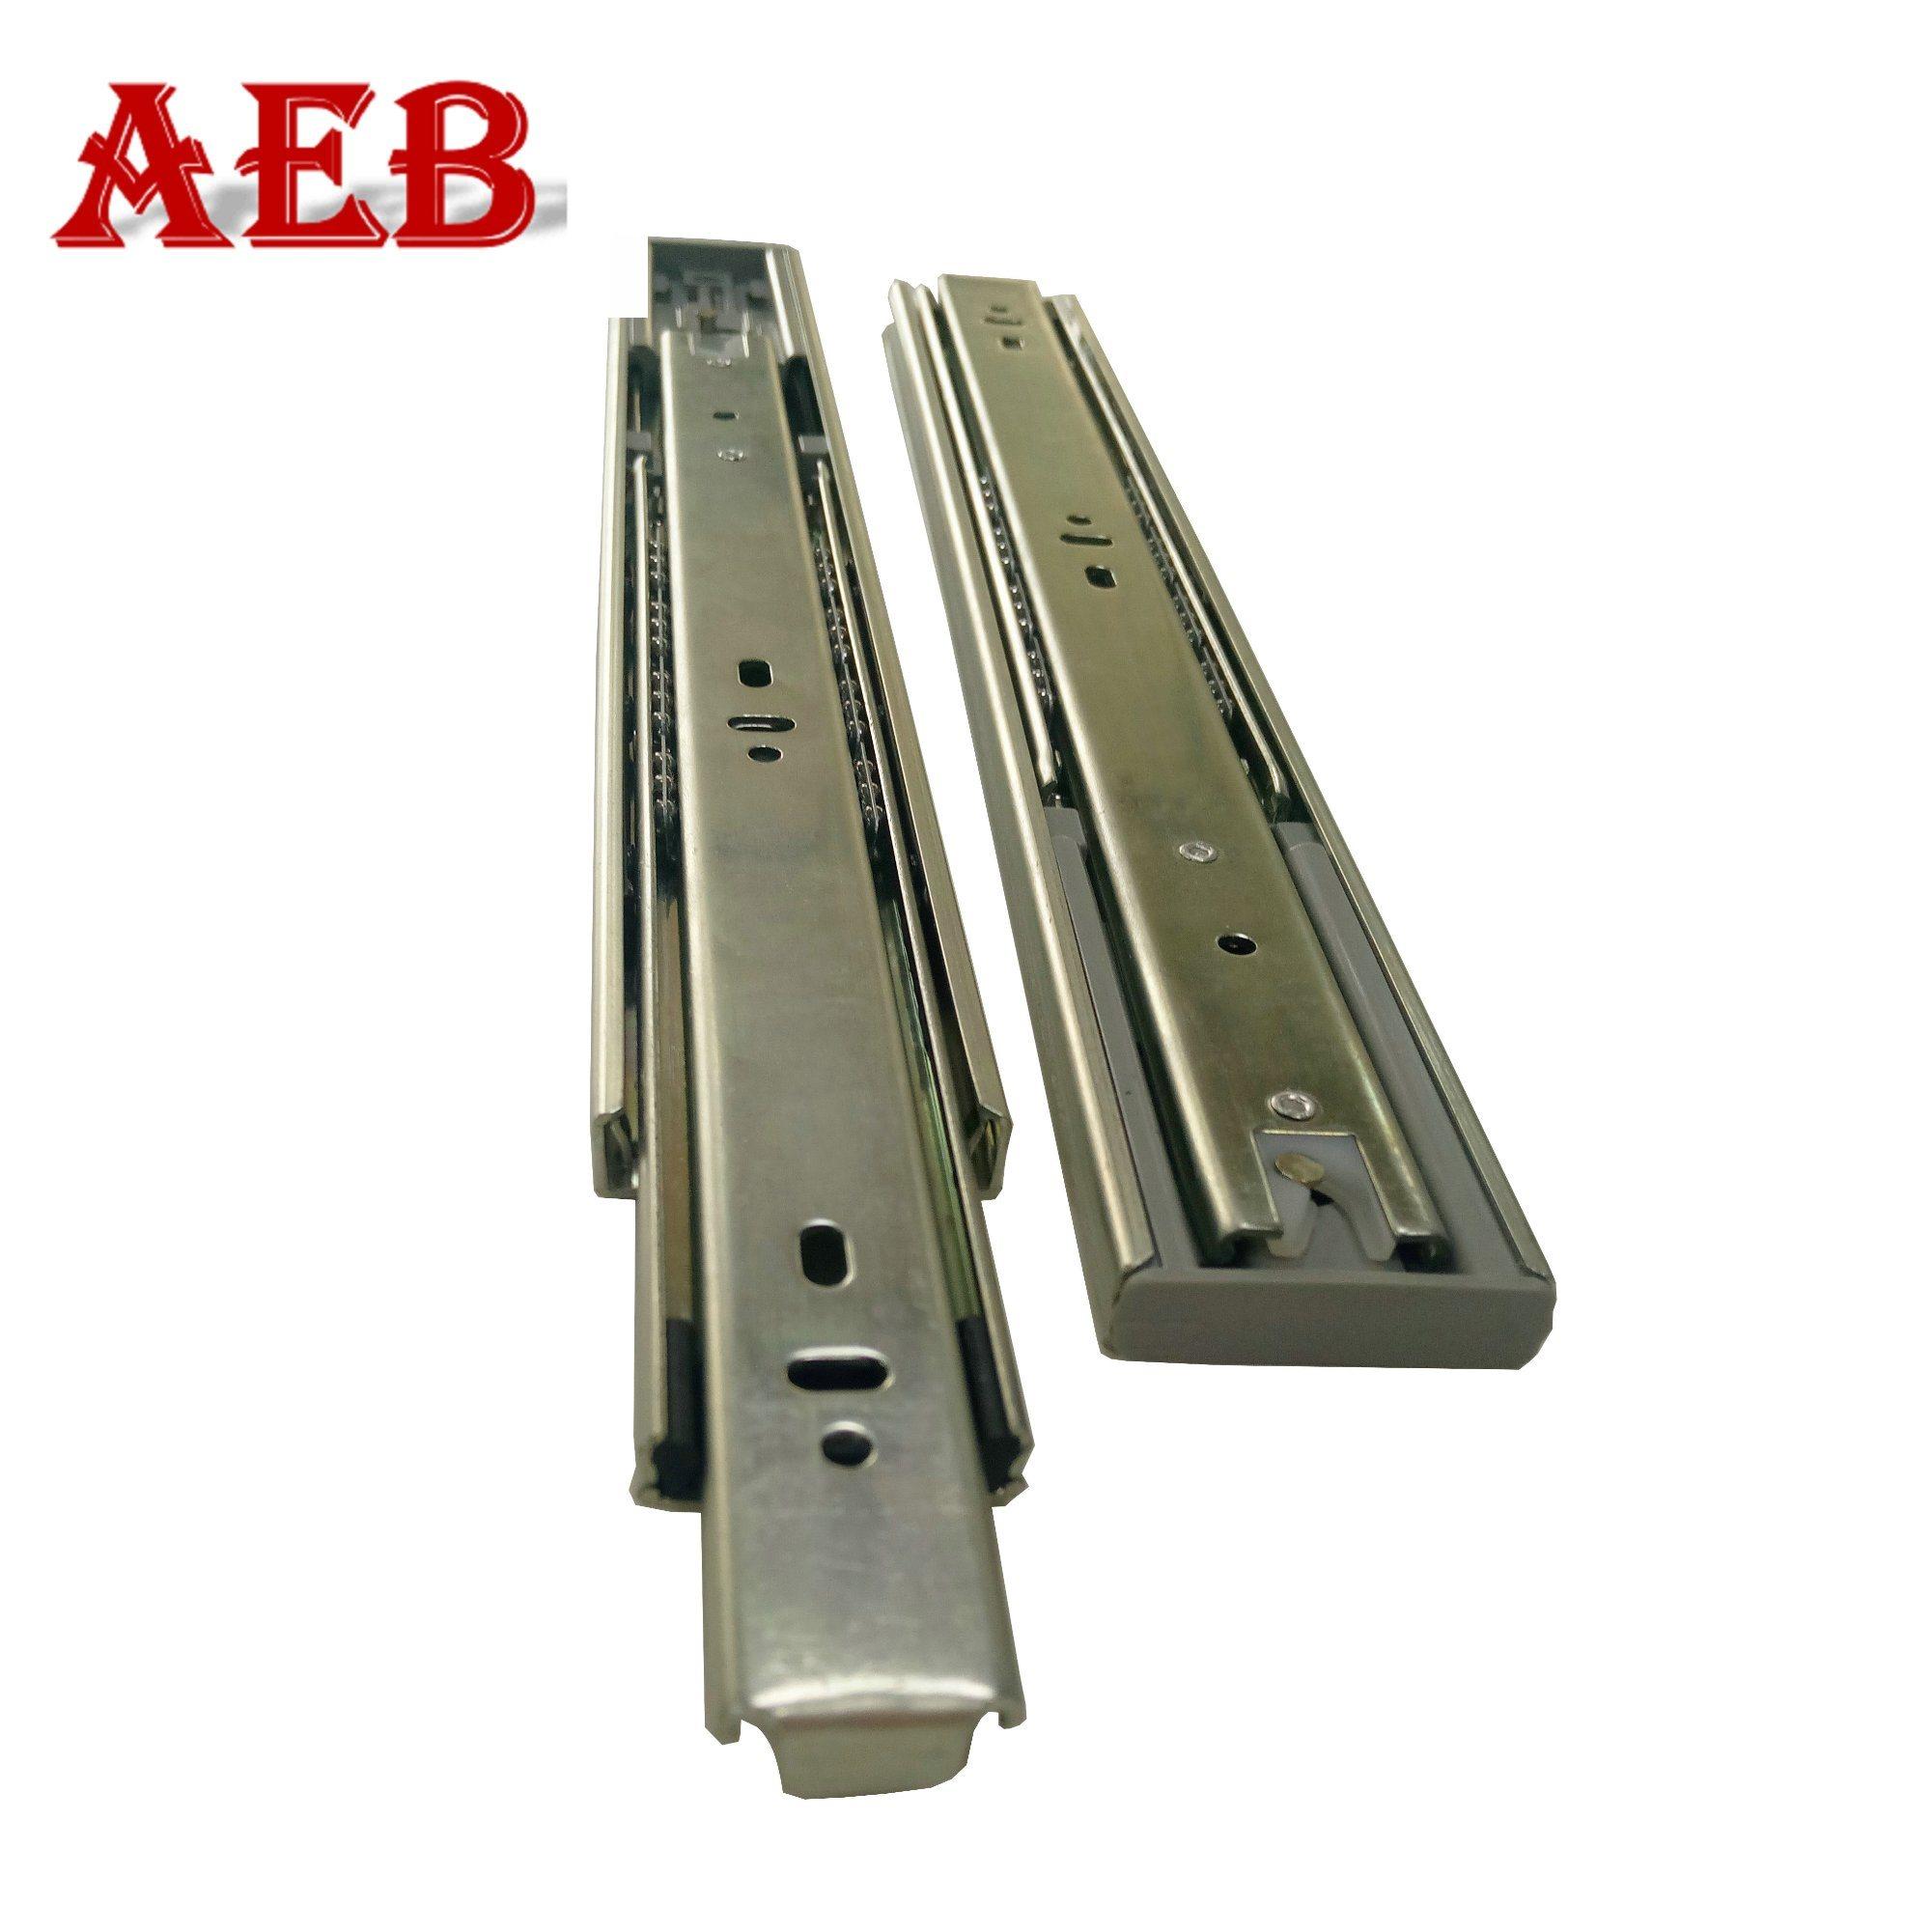 drawer product slides gjrmdvbeygwk ball bottom for pull china drawers brackets telescopic out sliding channel furniture bearing fittings hardware rails